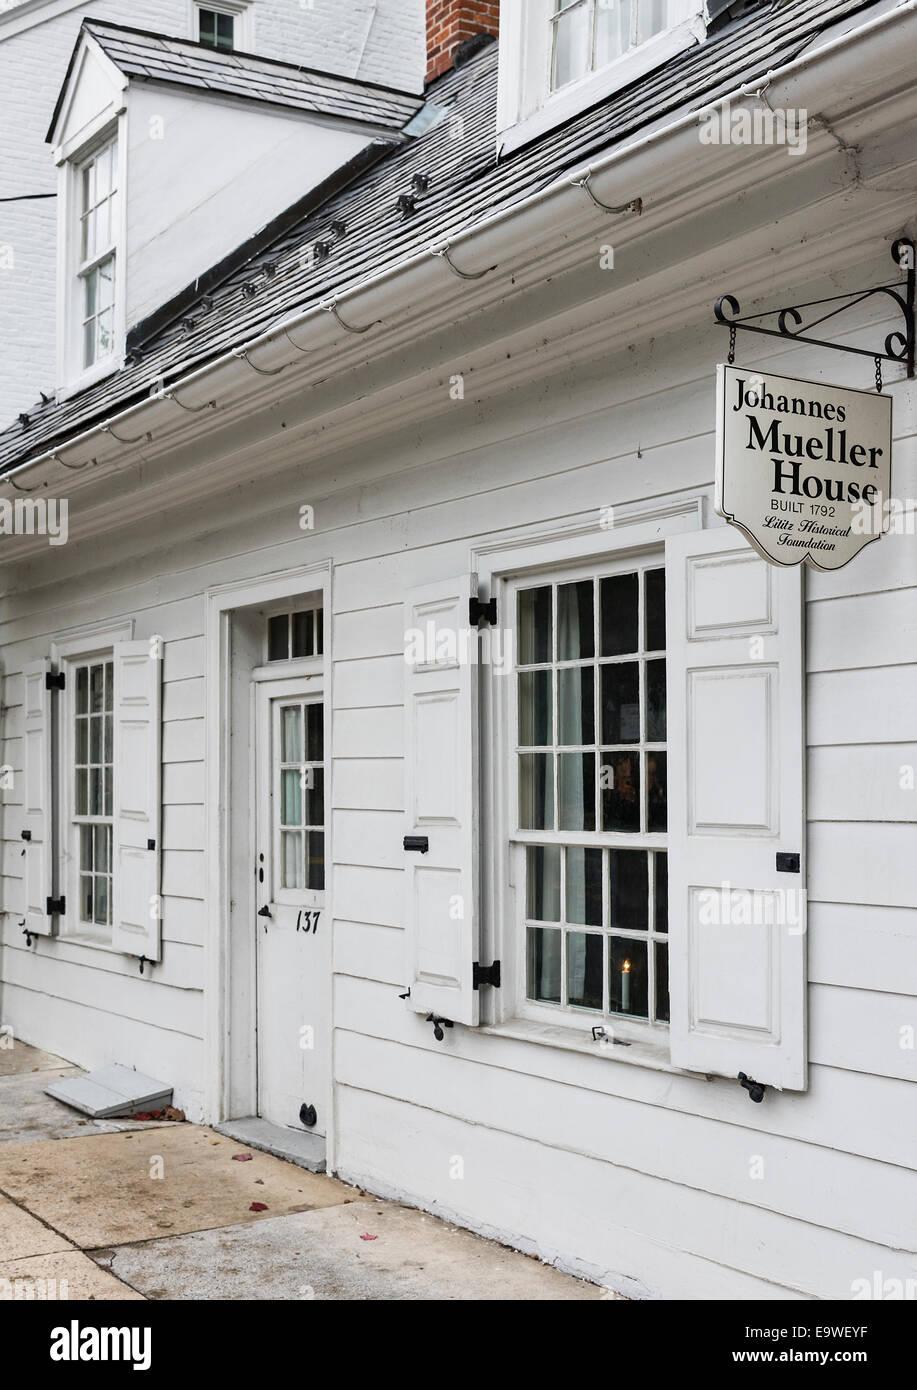 Johannes Mueller House, Lititz, Pennsylvania, USA - Stock Image